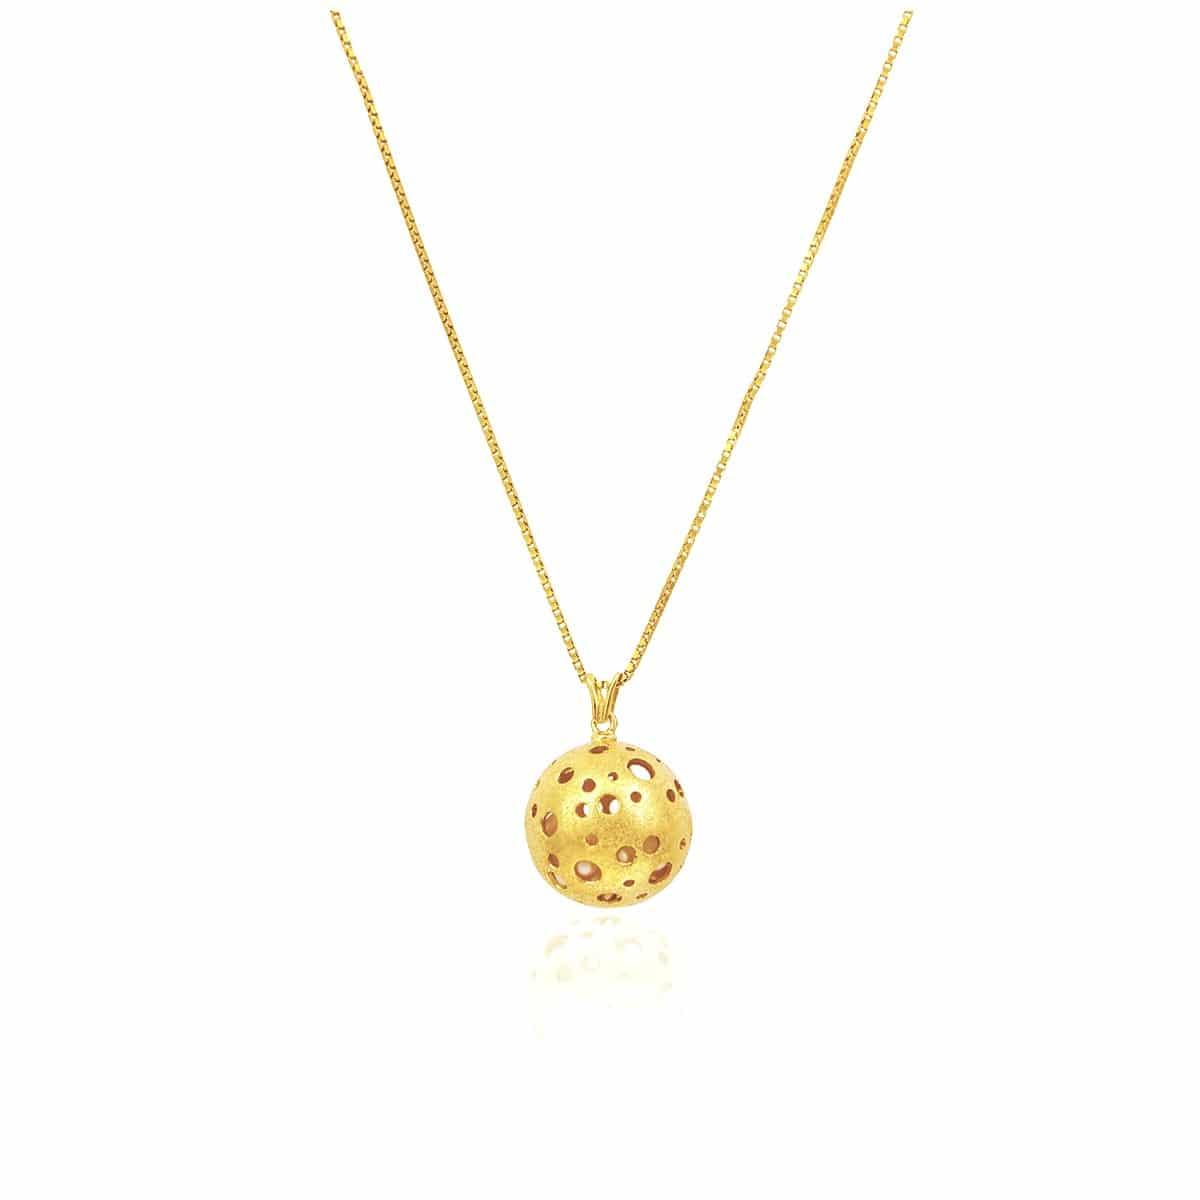 Collar Bolita de Plata Chapado en Oro